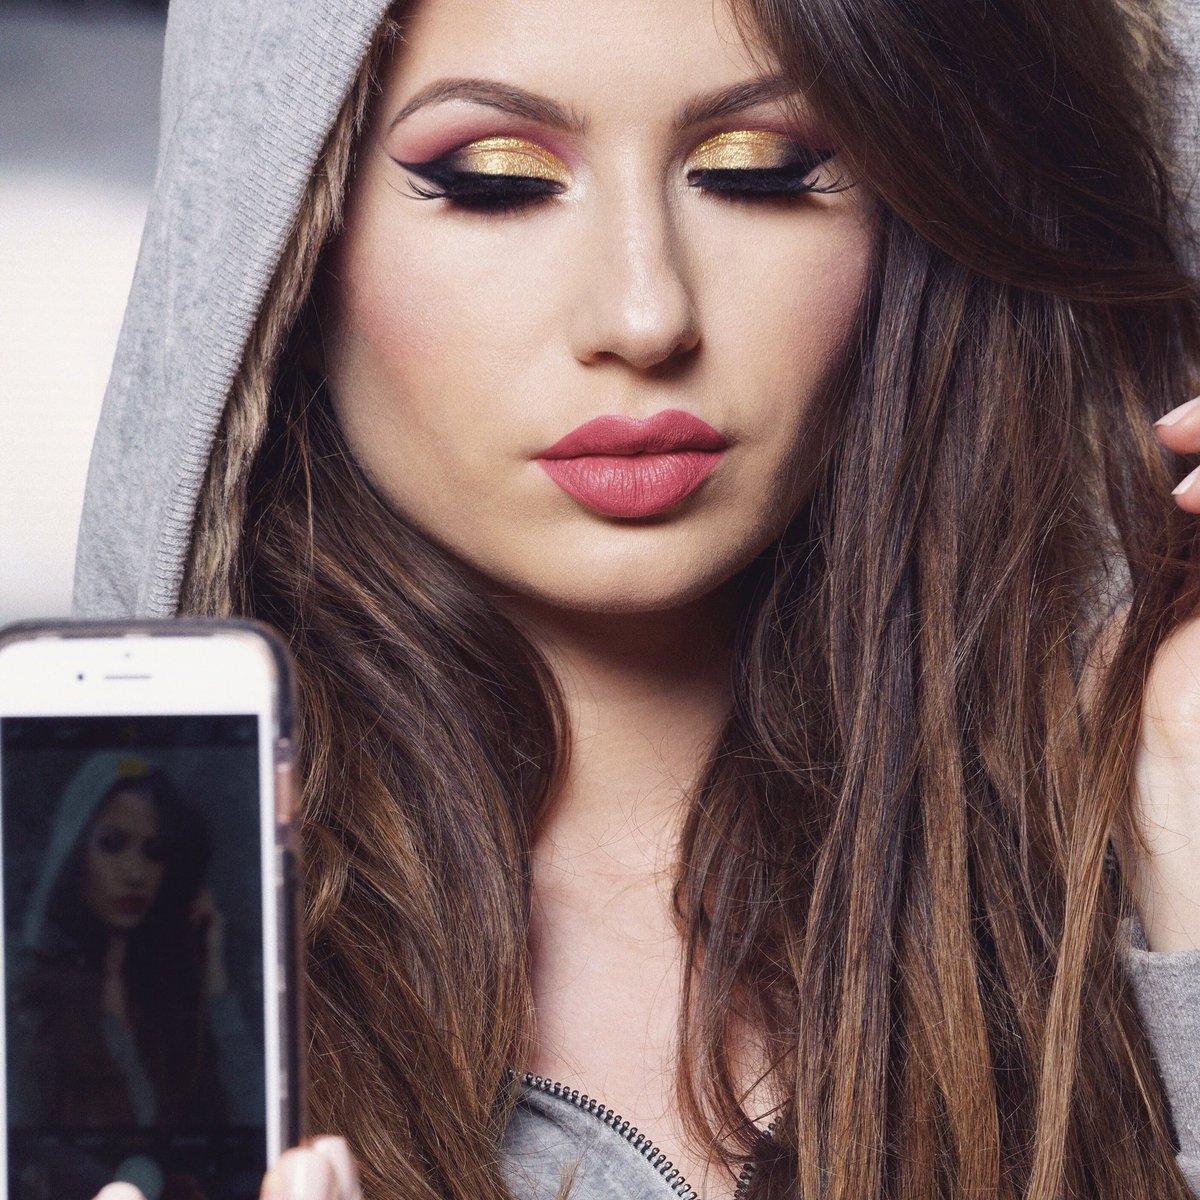 Kat Pro Mua On Twitter Getting A Pixel Perfect Selfie Using